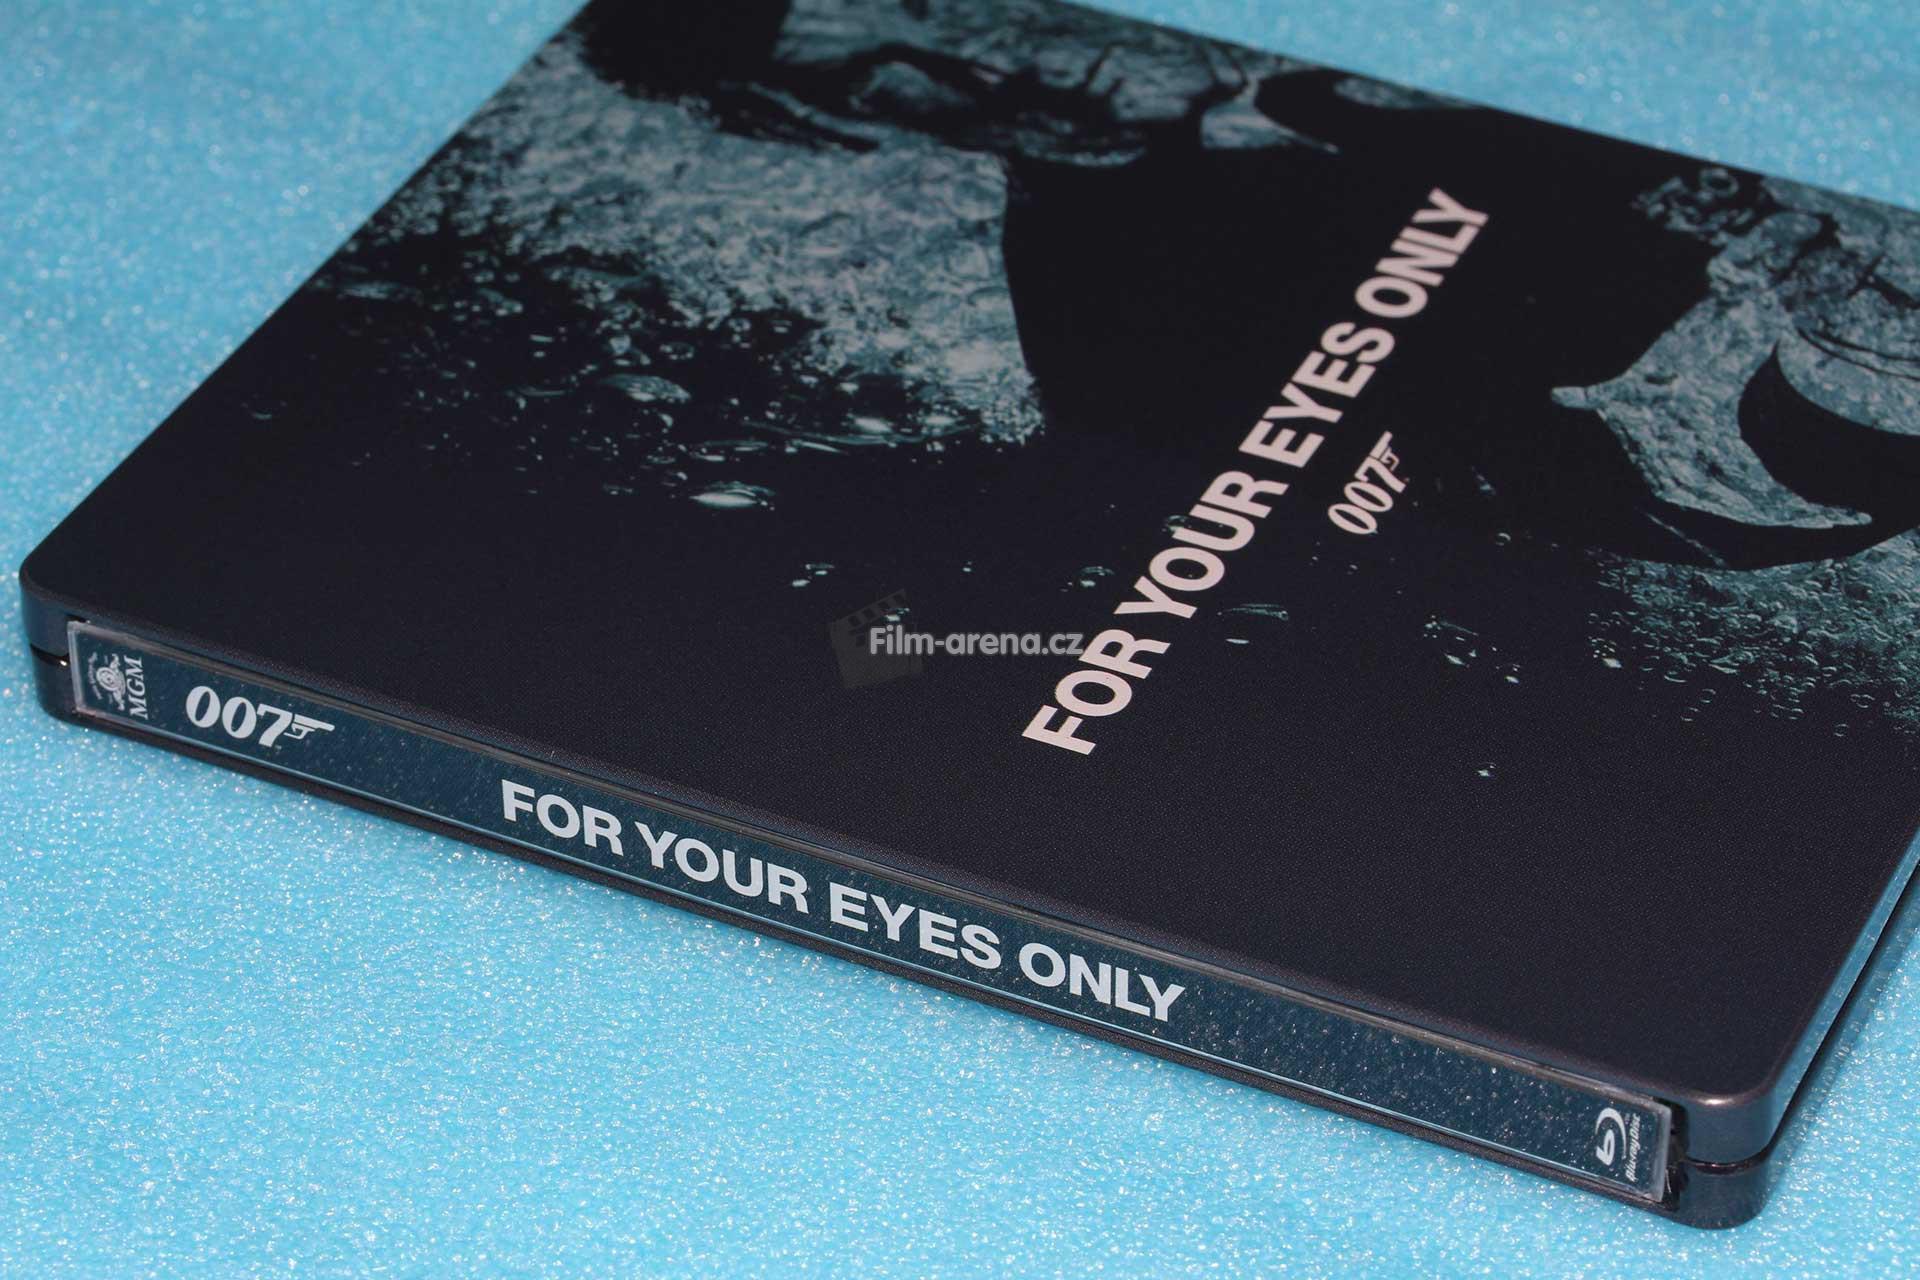 http://www.filmarena.cz/upload/images/nazivo/James_Bond/1981_Jen_pro_tve_oci/1981_oci_10.jpg